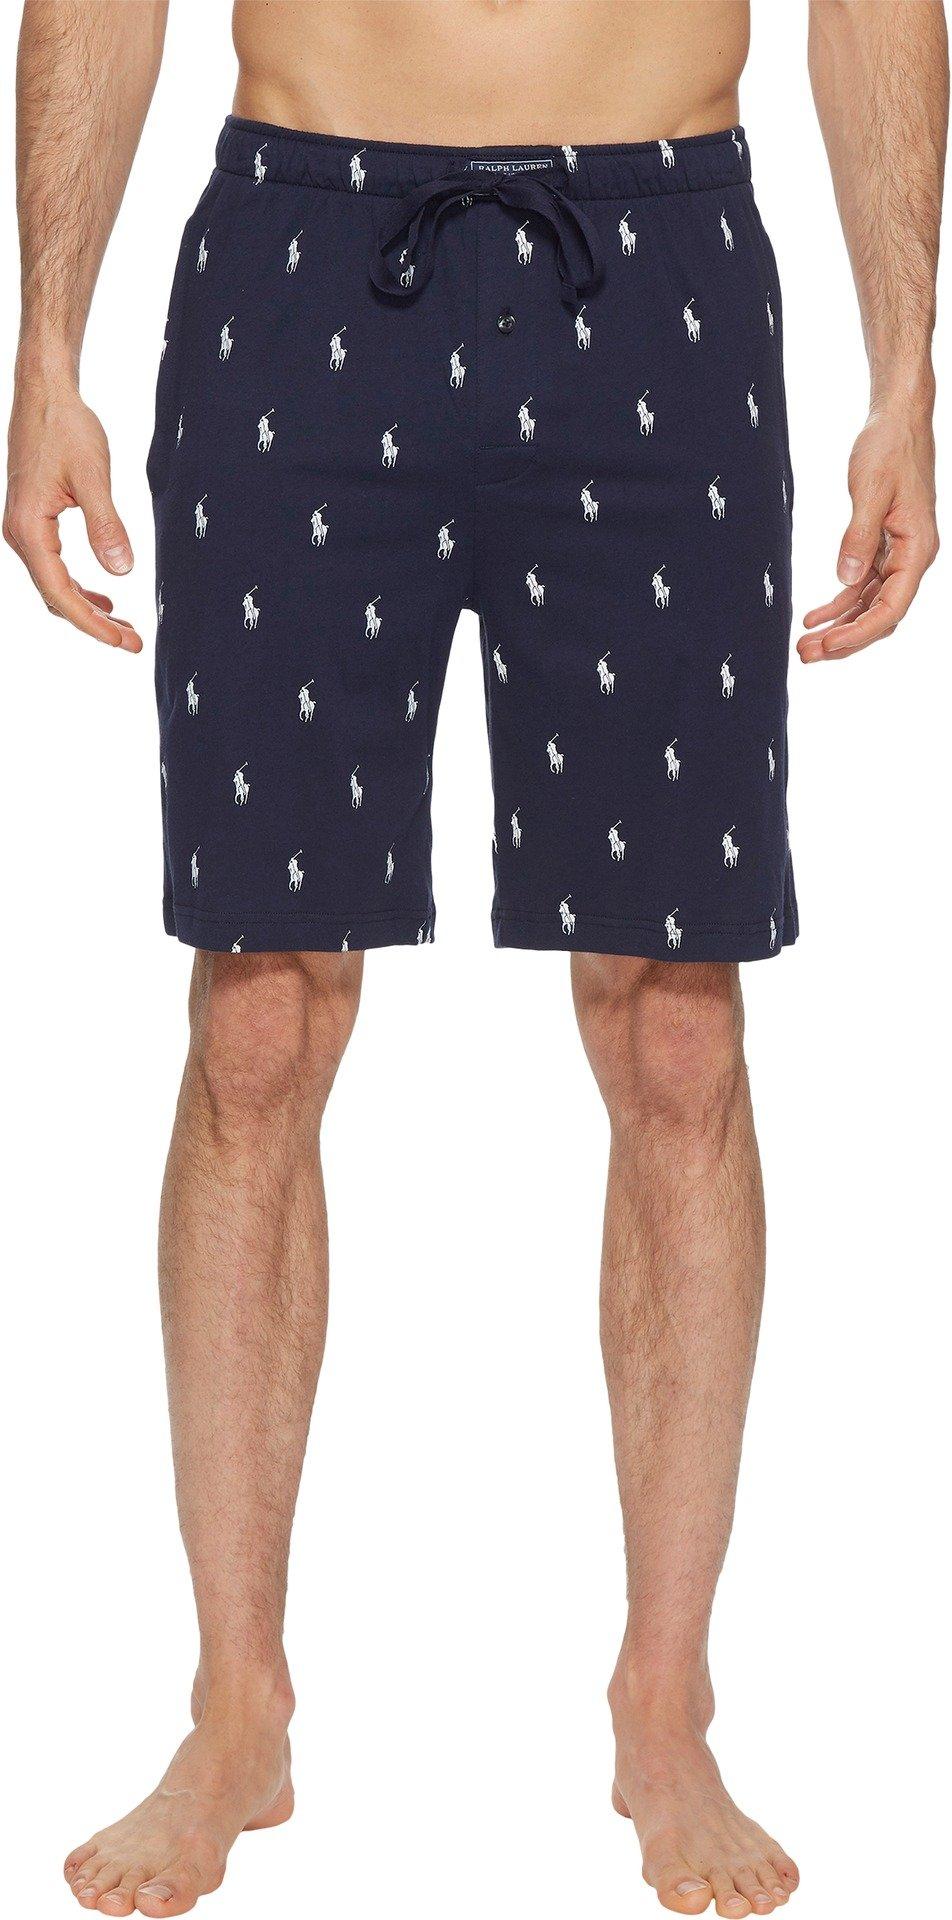 Polo Ralph Lauren Knit Sleep Short, L, Cruise Navy